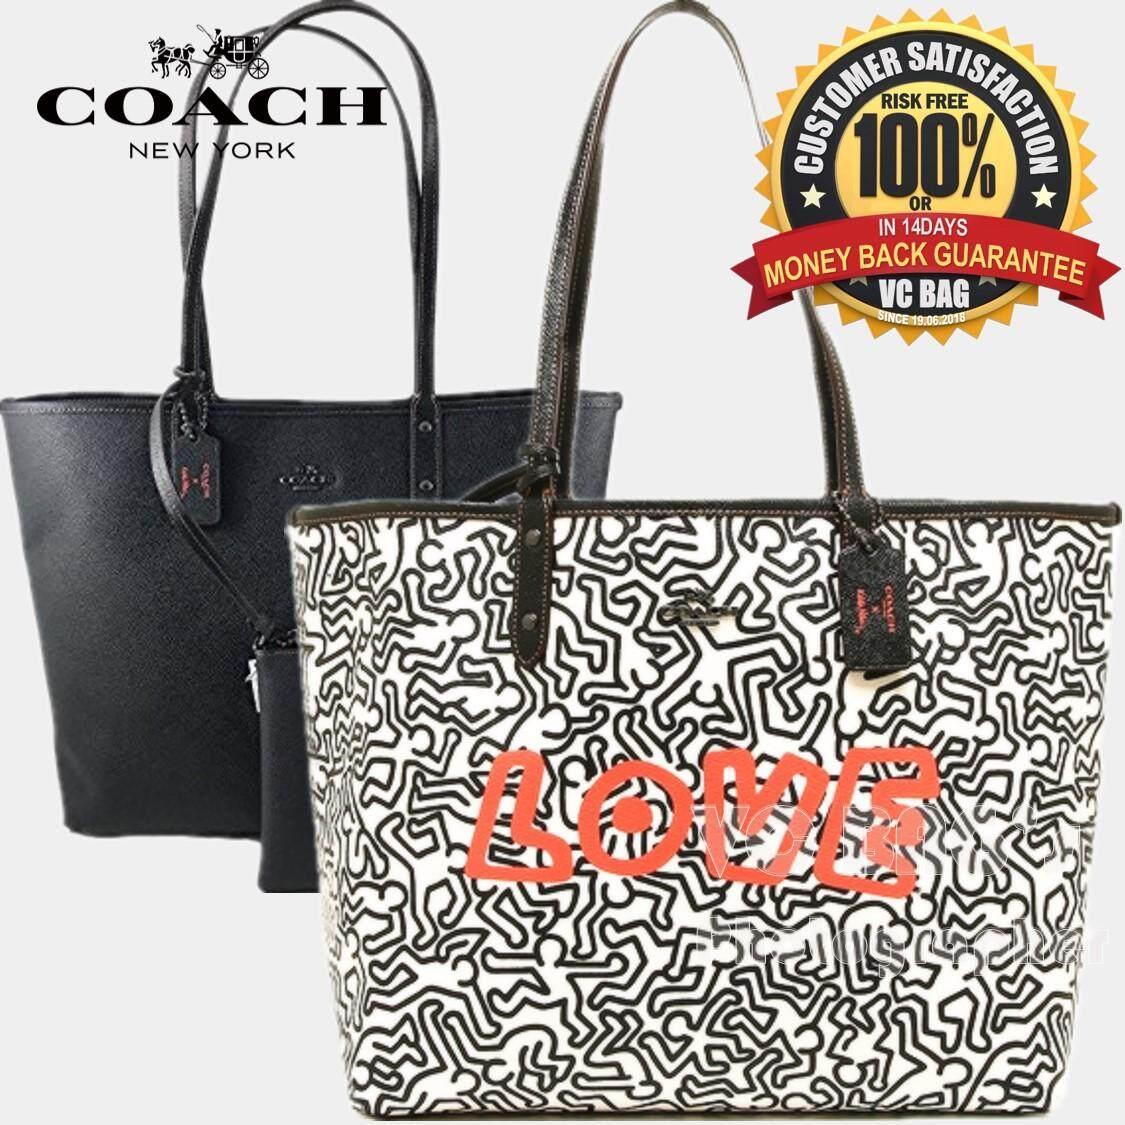 COACH X KEITH HARING F11765 Reversible City Tote Bag  Chalk Black  a723de20b66e1